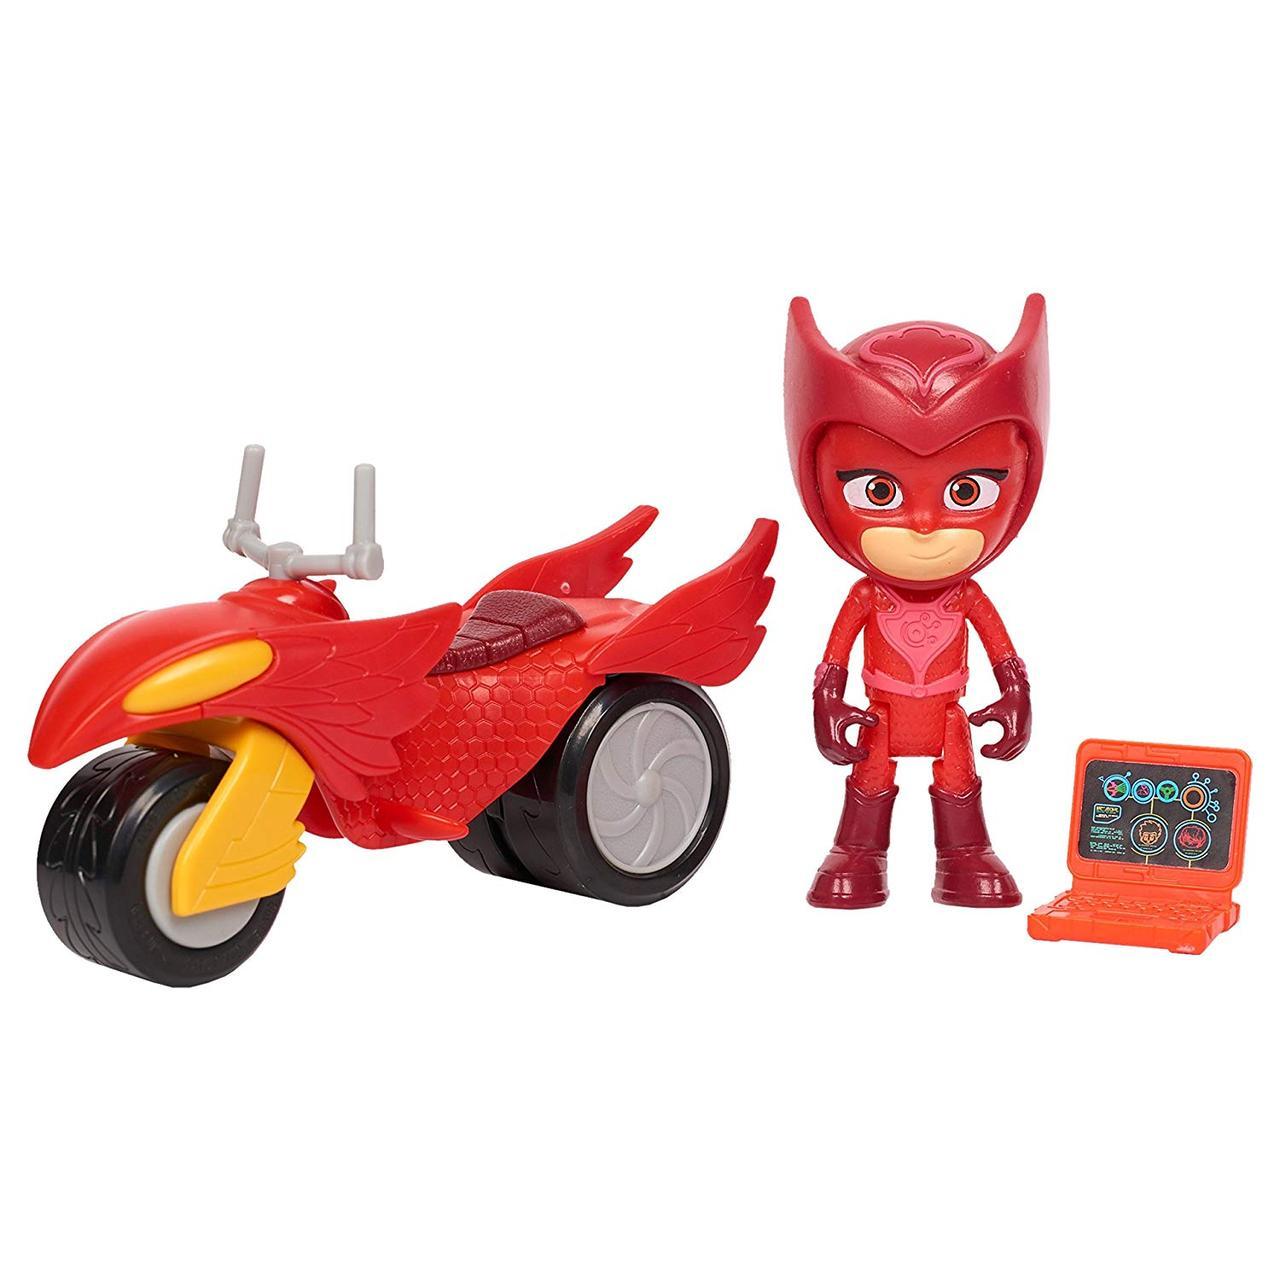 Игровой набор - PJ Masks Super Moon Rovers Owlette Toy, Red/Yellow/Black (Герои в масках. Алетт и луноход)